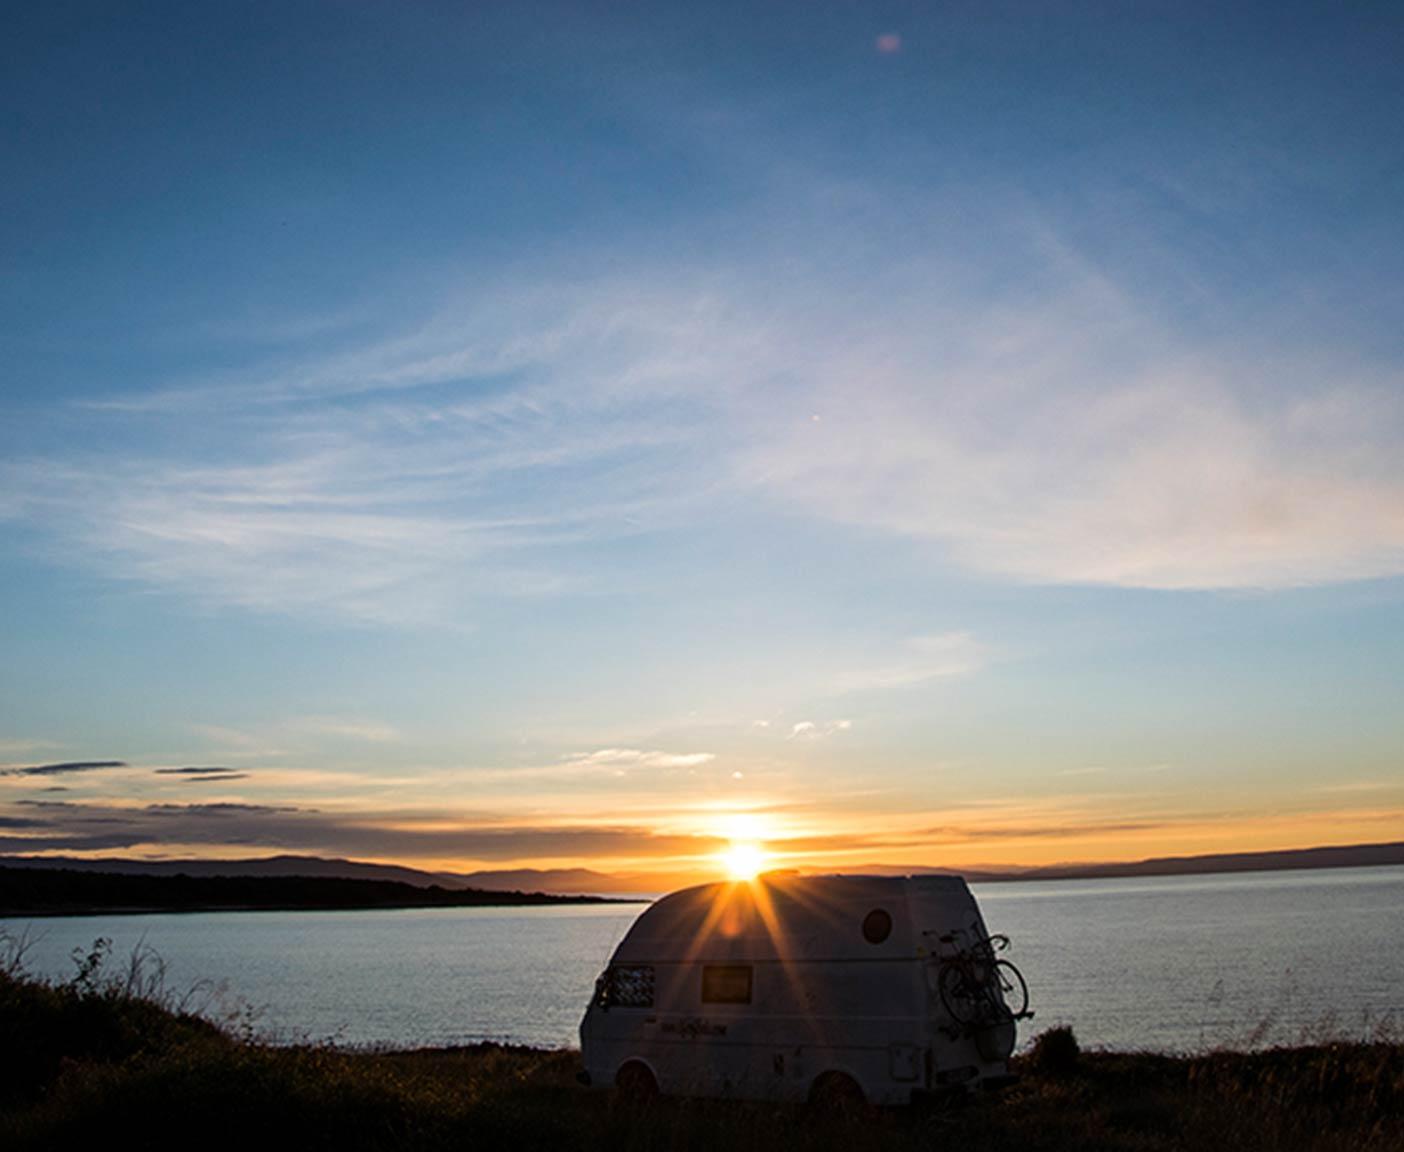 Camper am See im Sonnenuntergang